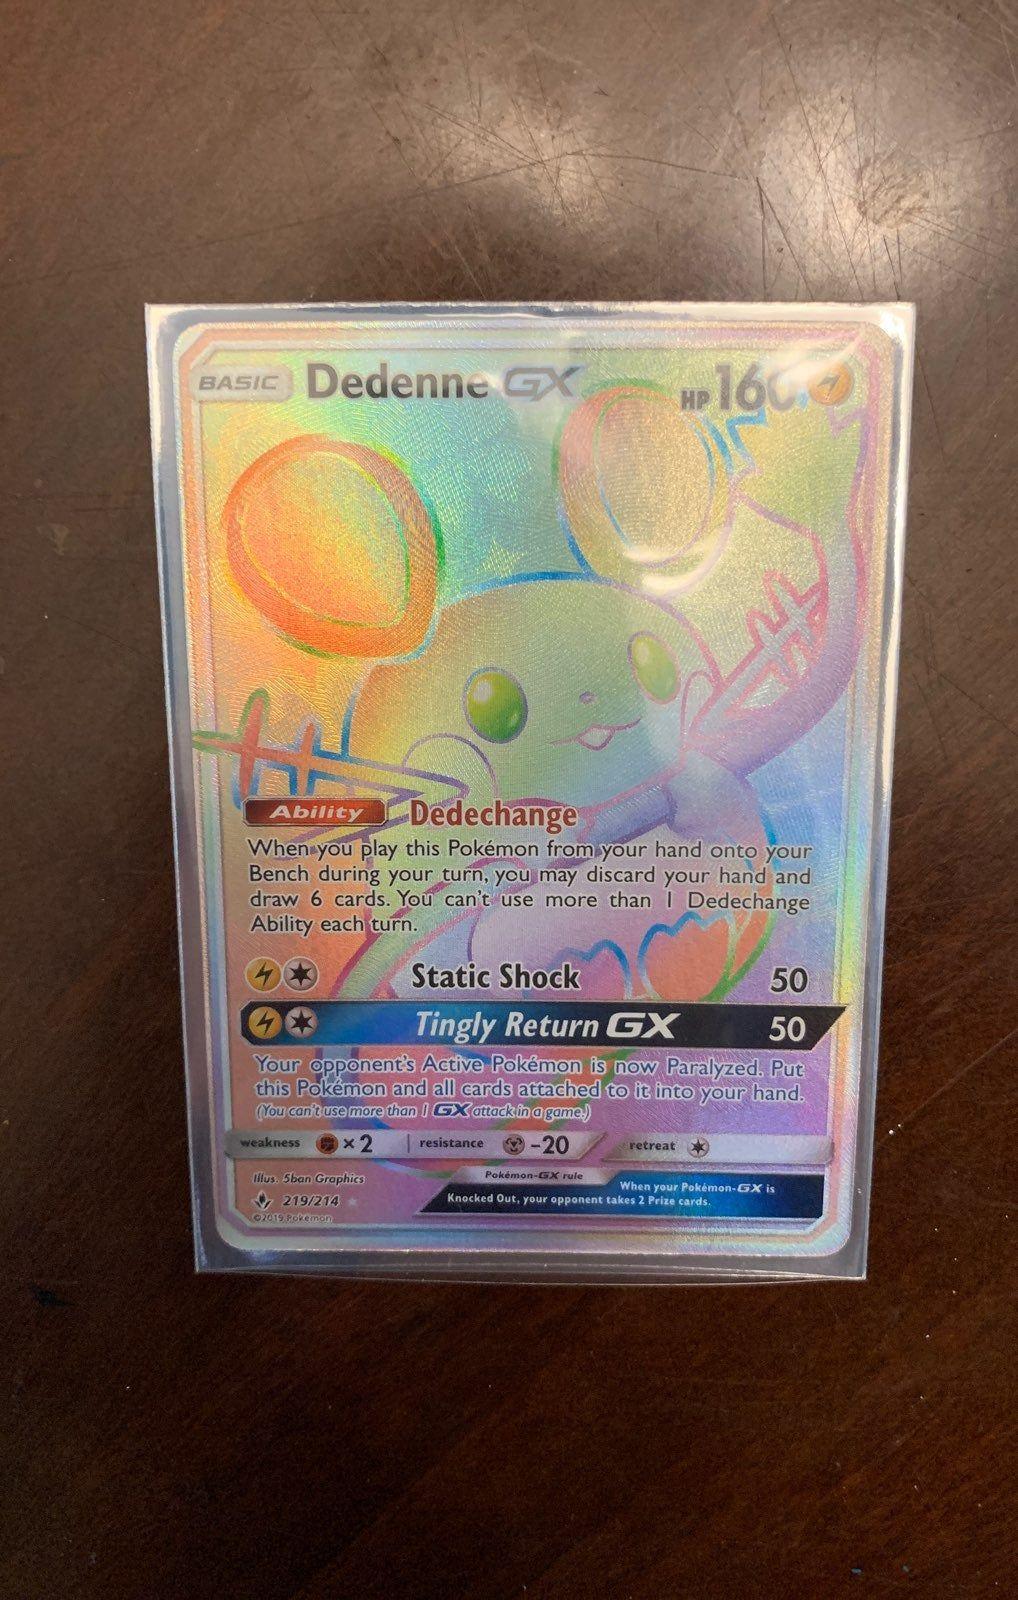 Dedenne gx rainbow rare 219214 pokemon trading card